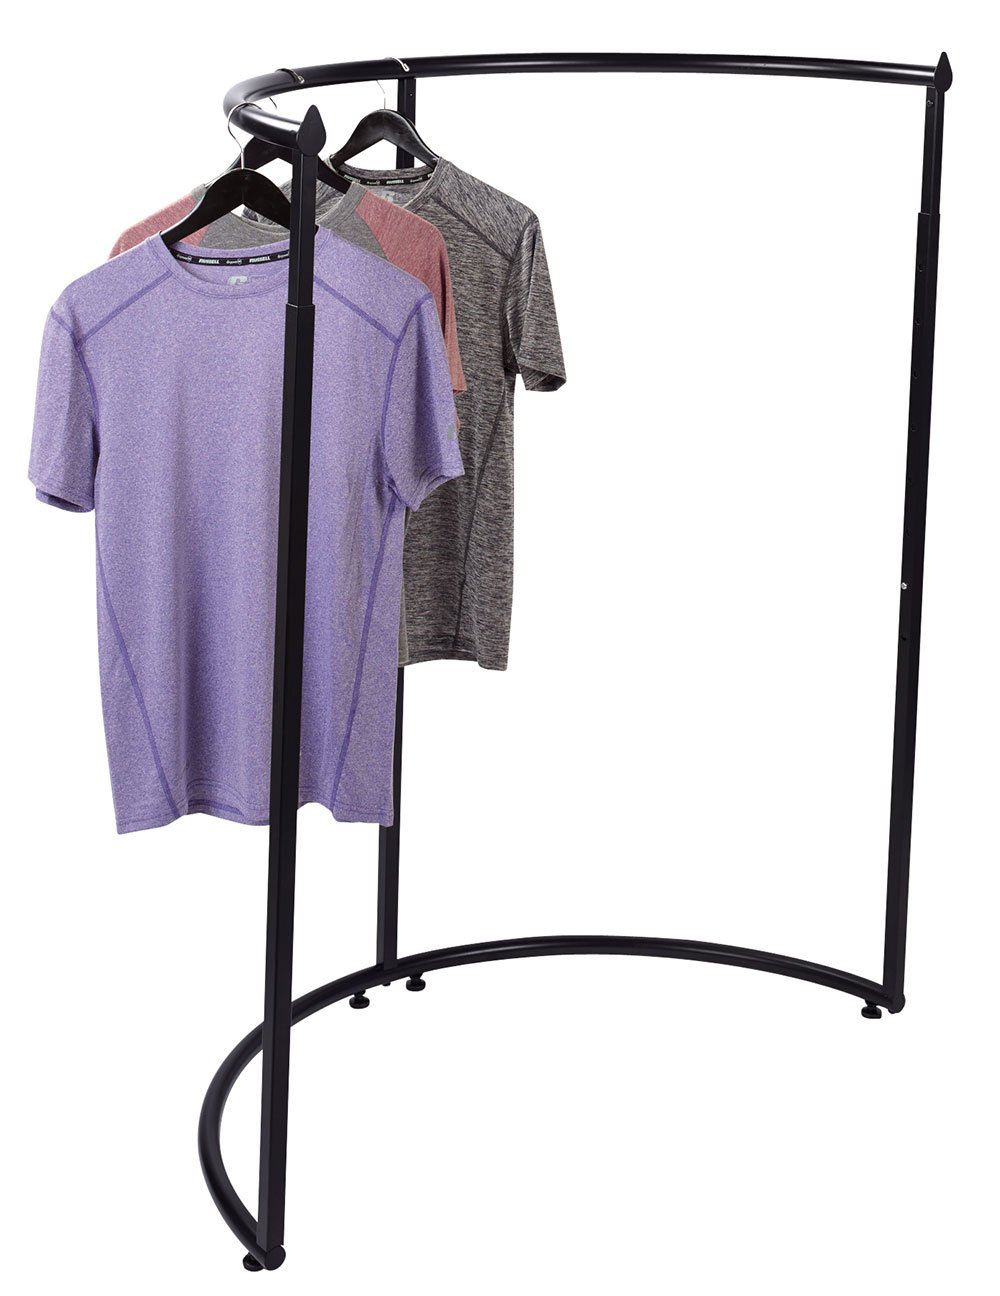 "35/""W x 35 D x 54/""H SSWBasics Boutique White Pipe Half Round Clothing Rack"